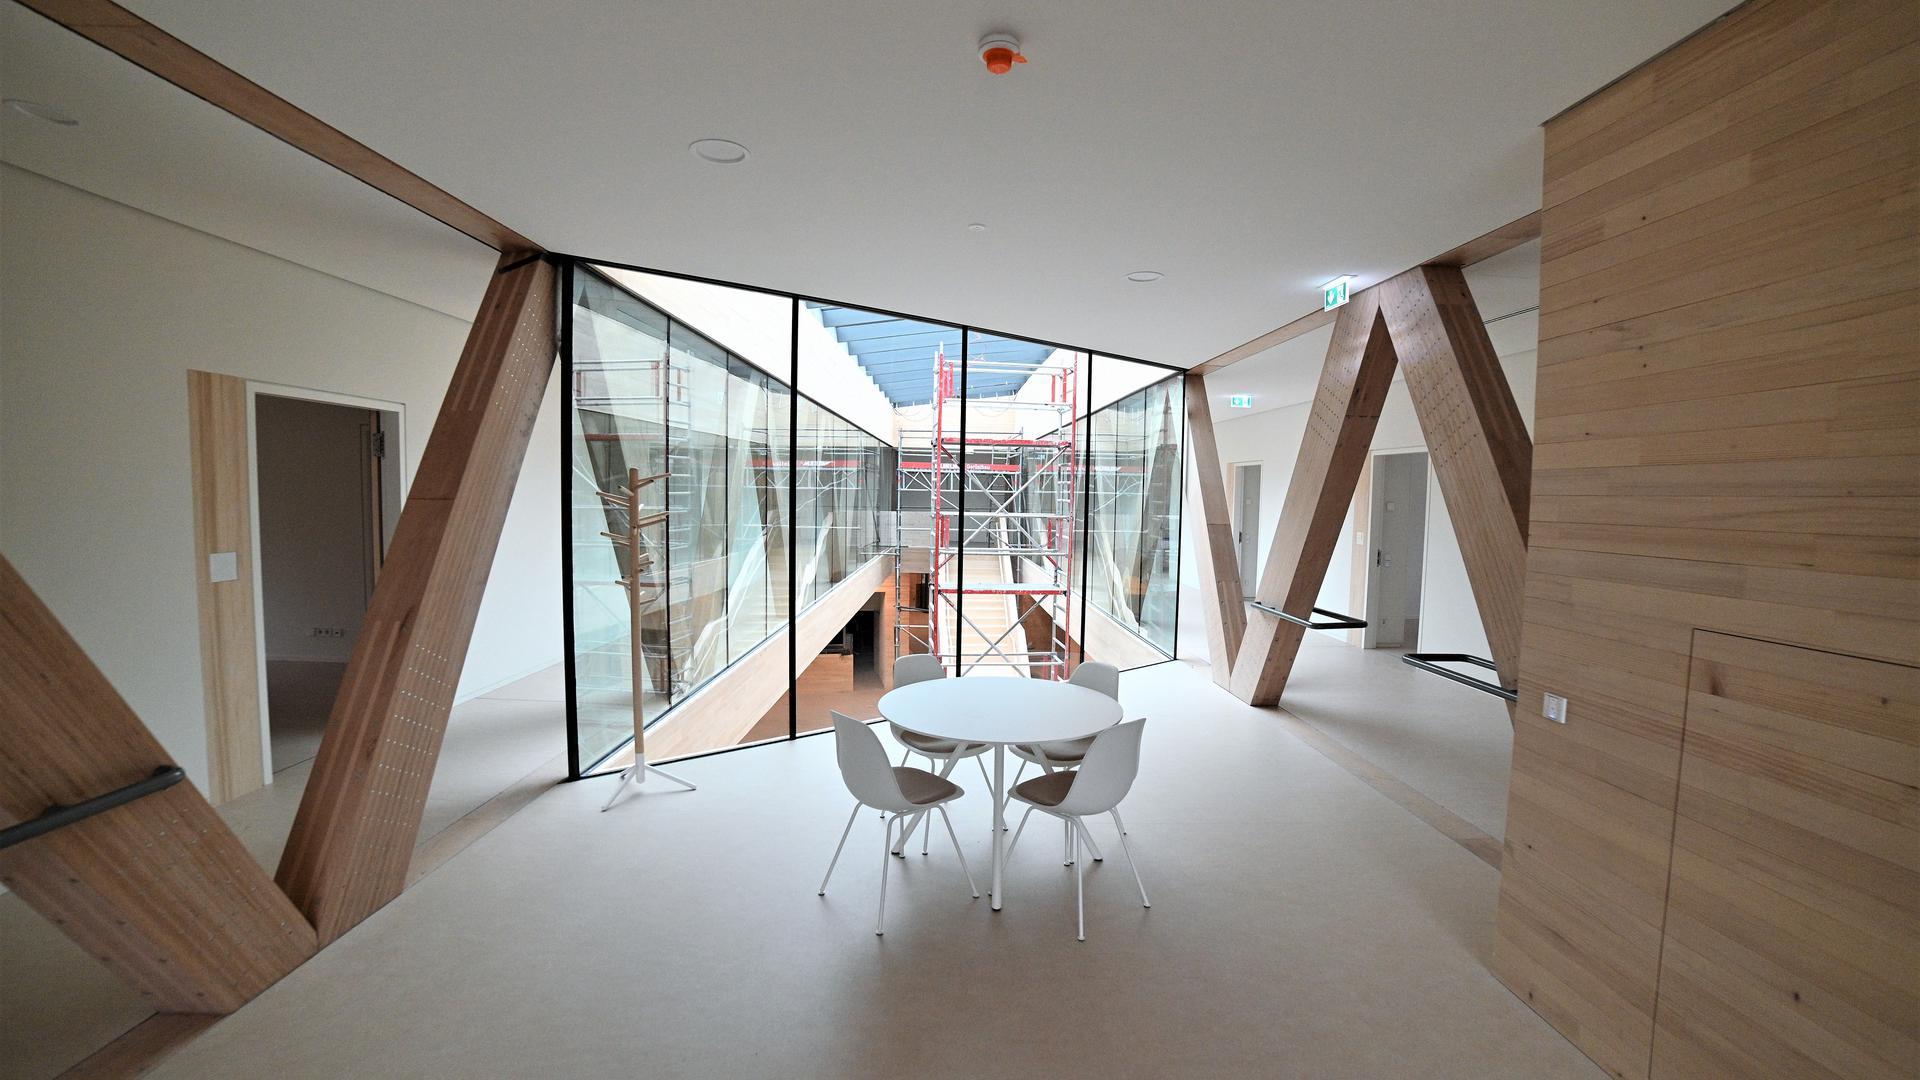 Foyer mit Blick ins Treppenhaus im Obergeschoss